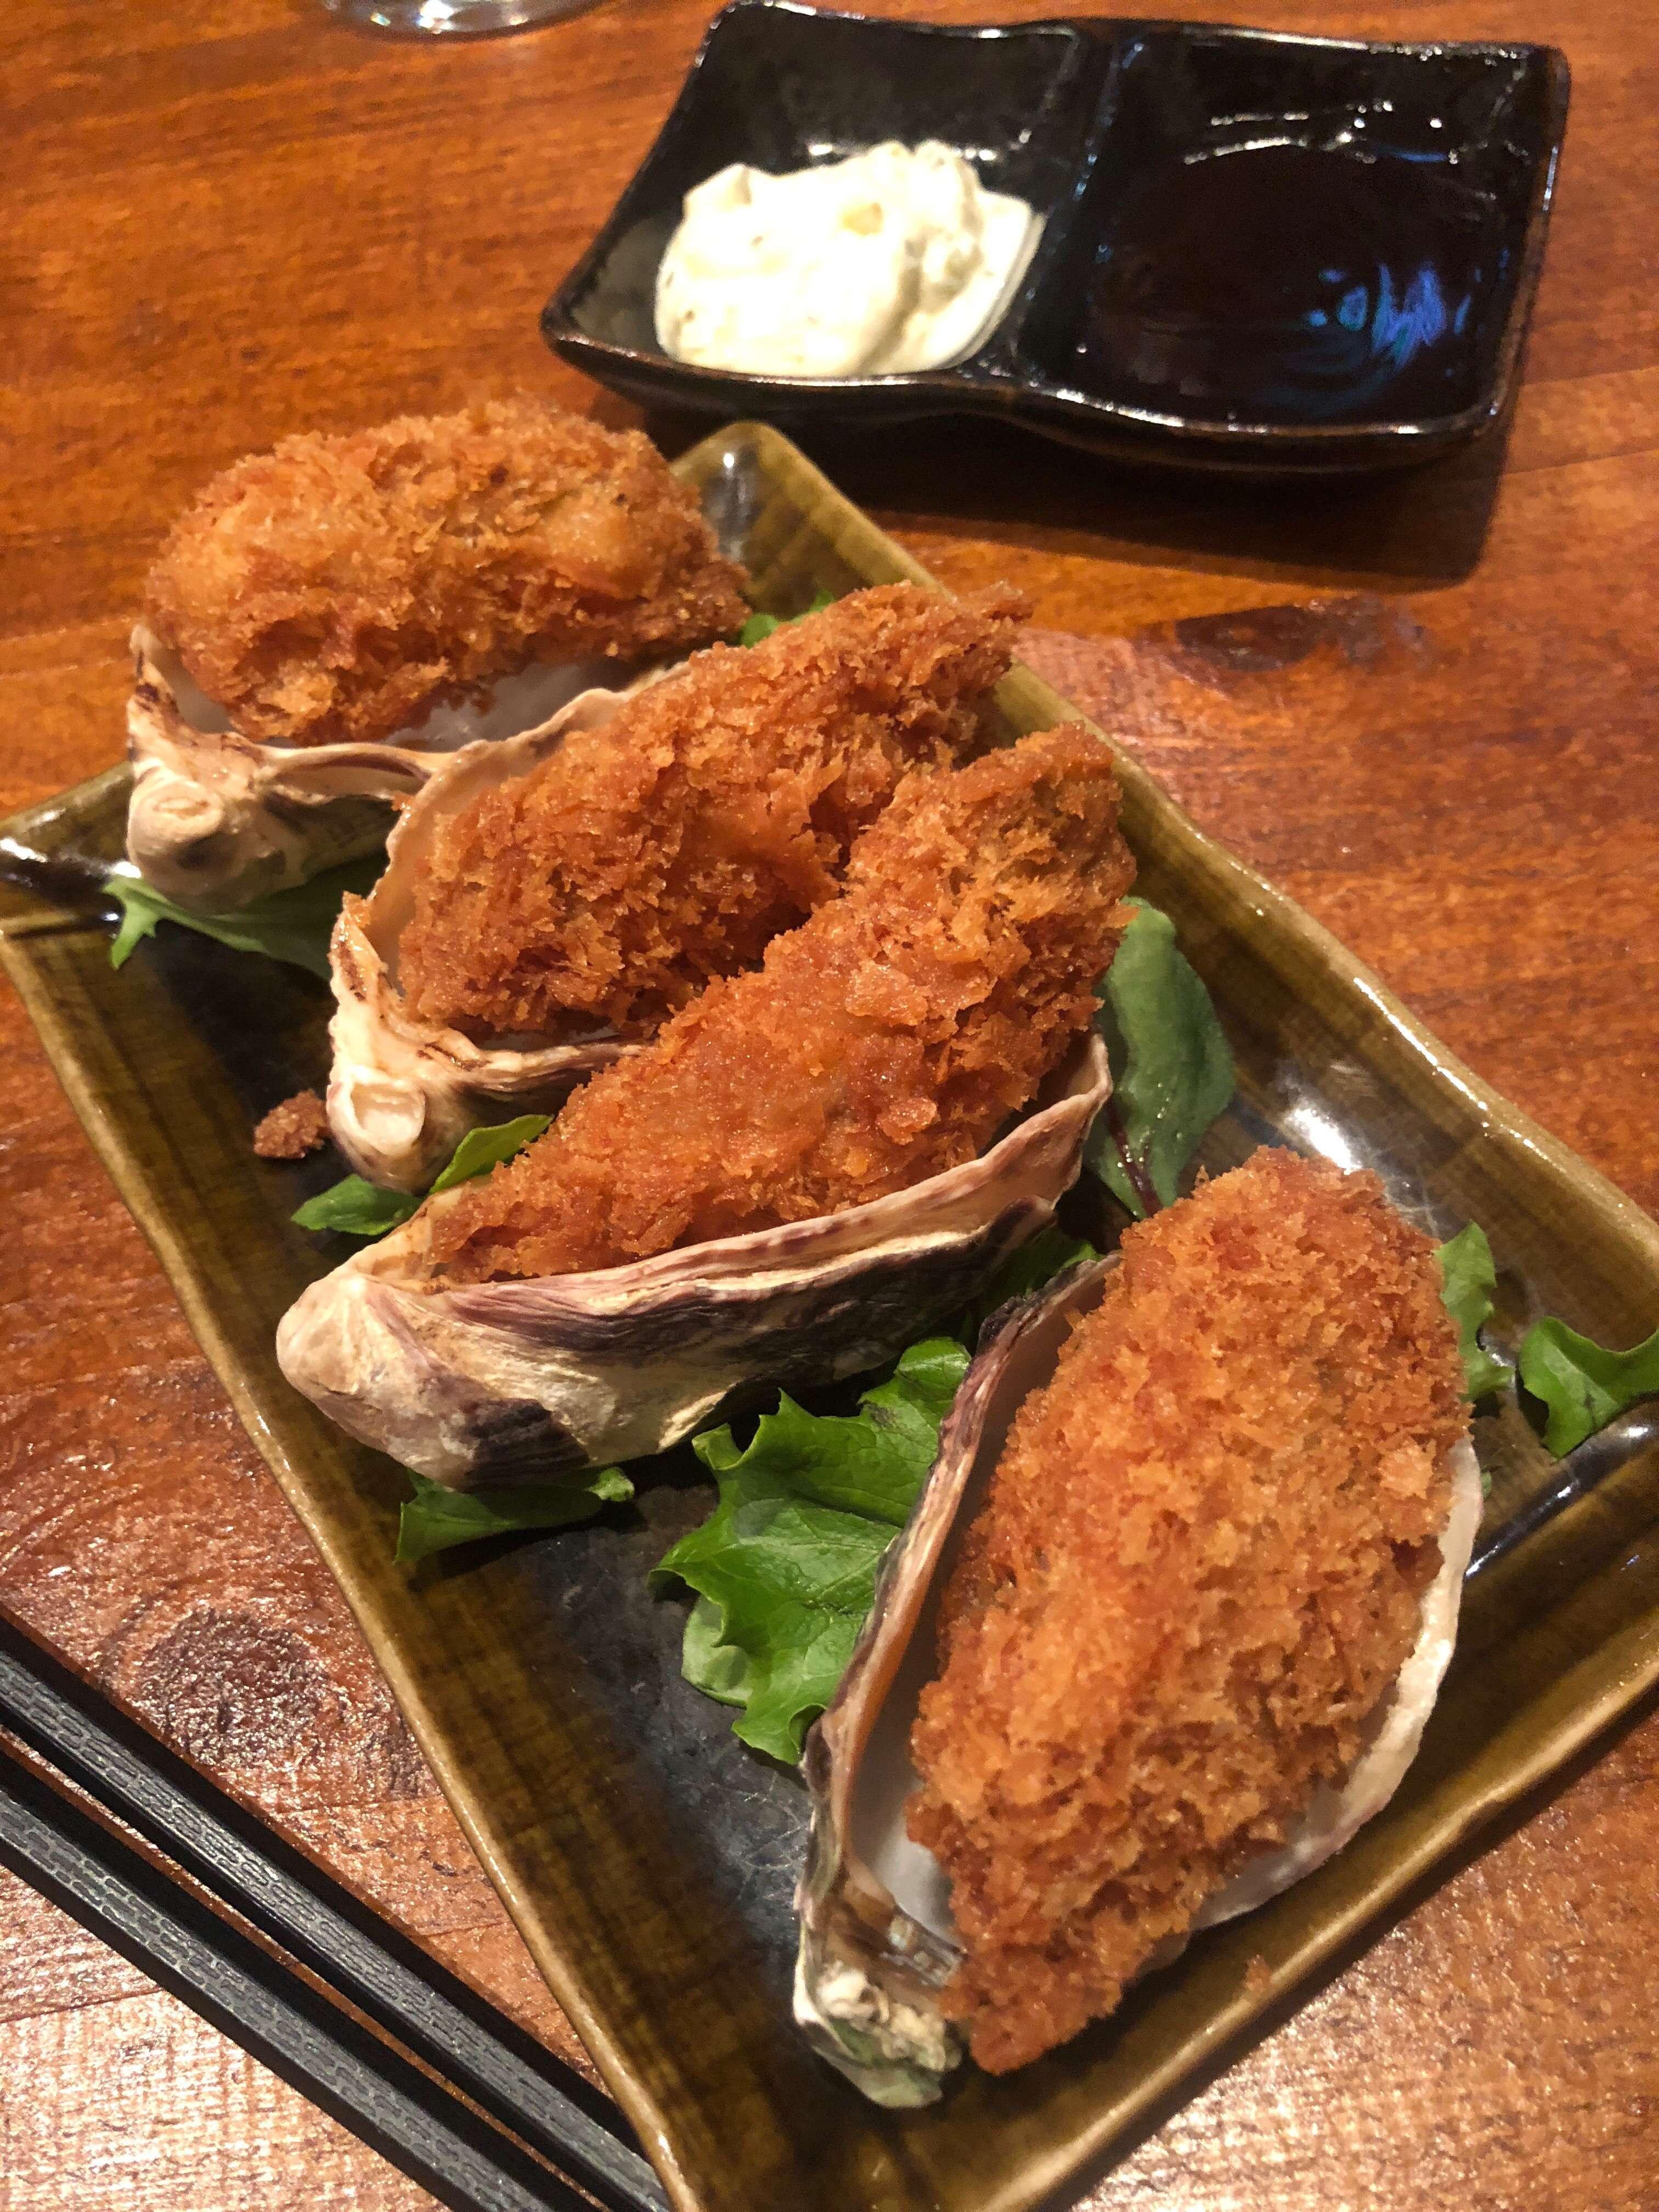 Kitchen Enn Japanese Restaurant | Shop 28 340 Hope Island Road, Hope Island, Queensland 4212 | +61 7 5510 8711